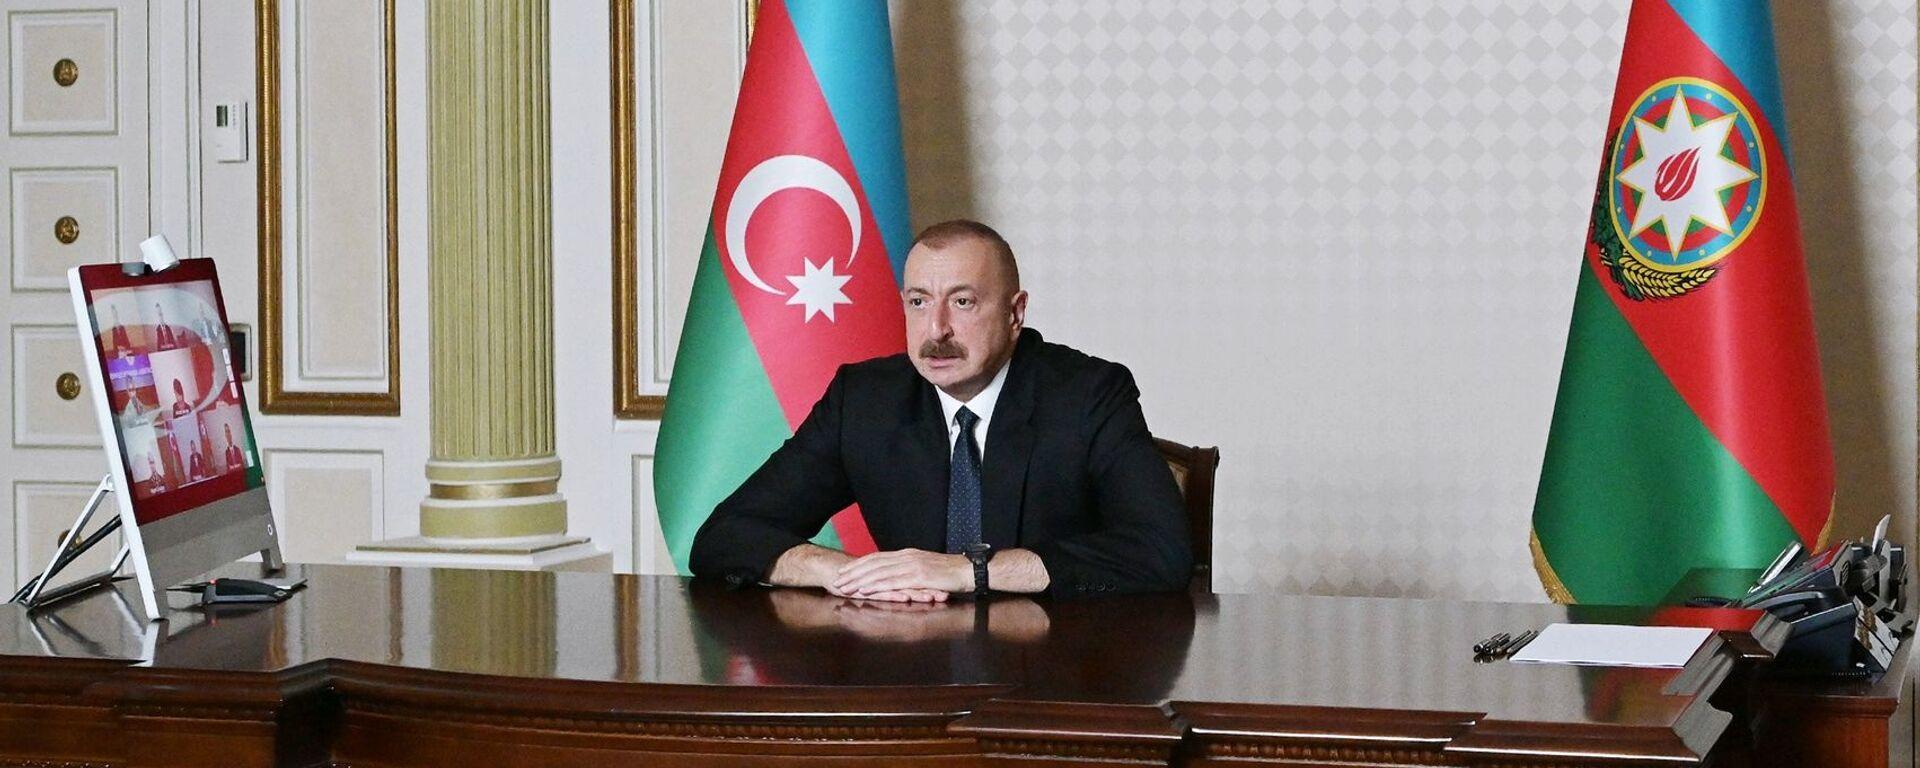 Il presidente azero Ilham Aliyev - Sputnik Italia, 1920, 07.01.2021